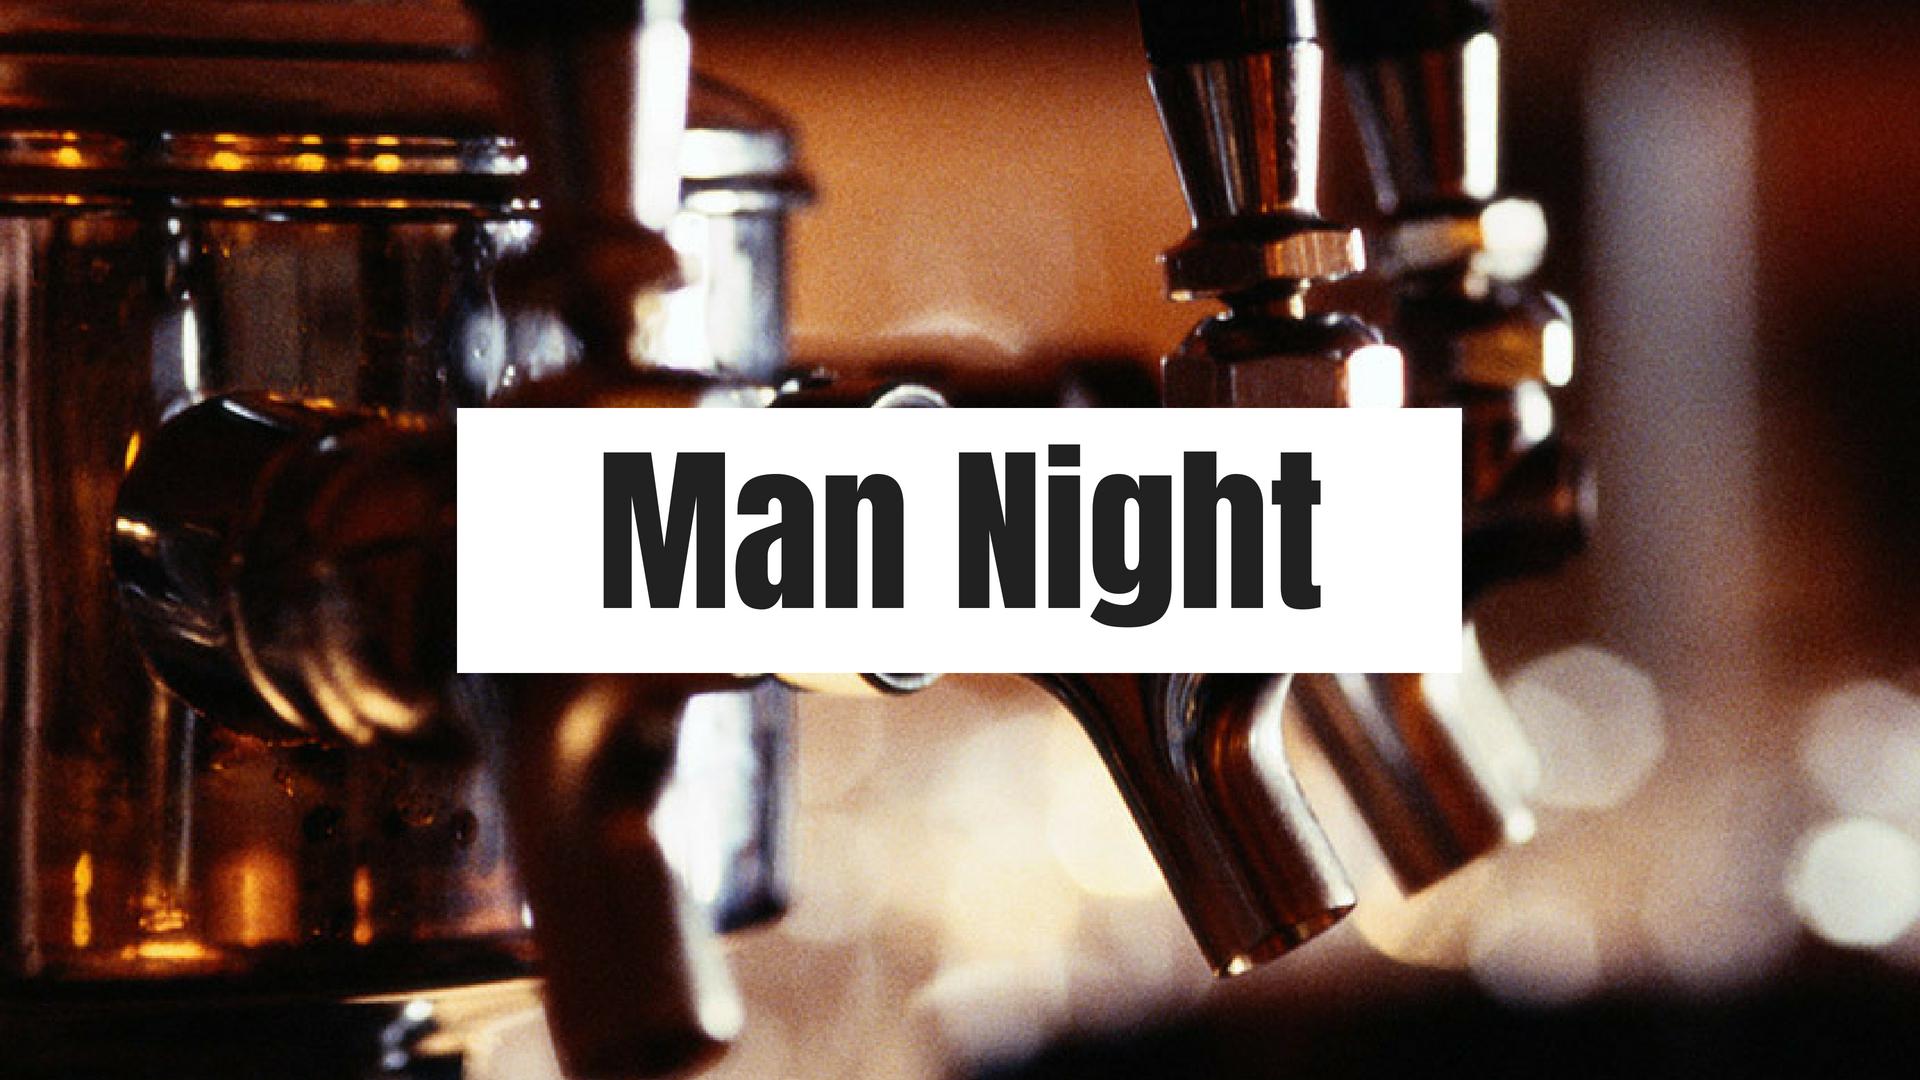 Man night JPG.jpg